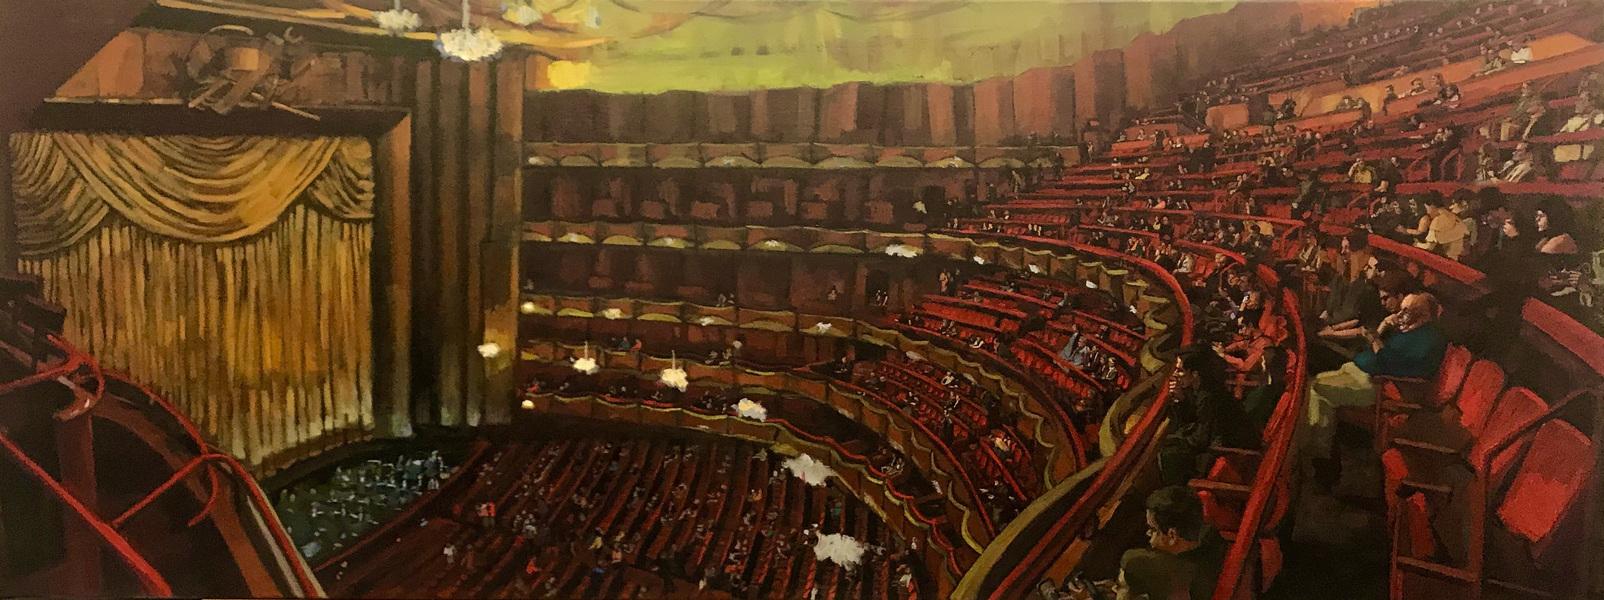 Danny Glass - Met Opera House